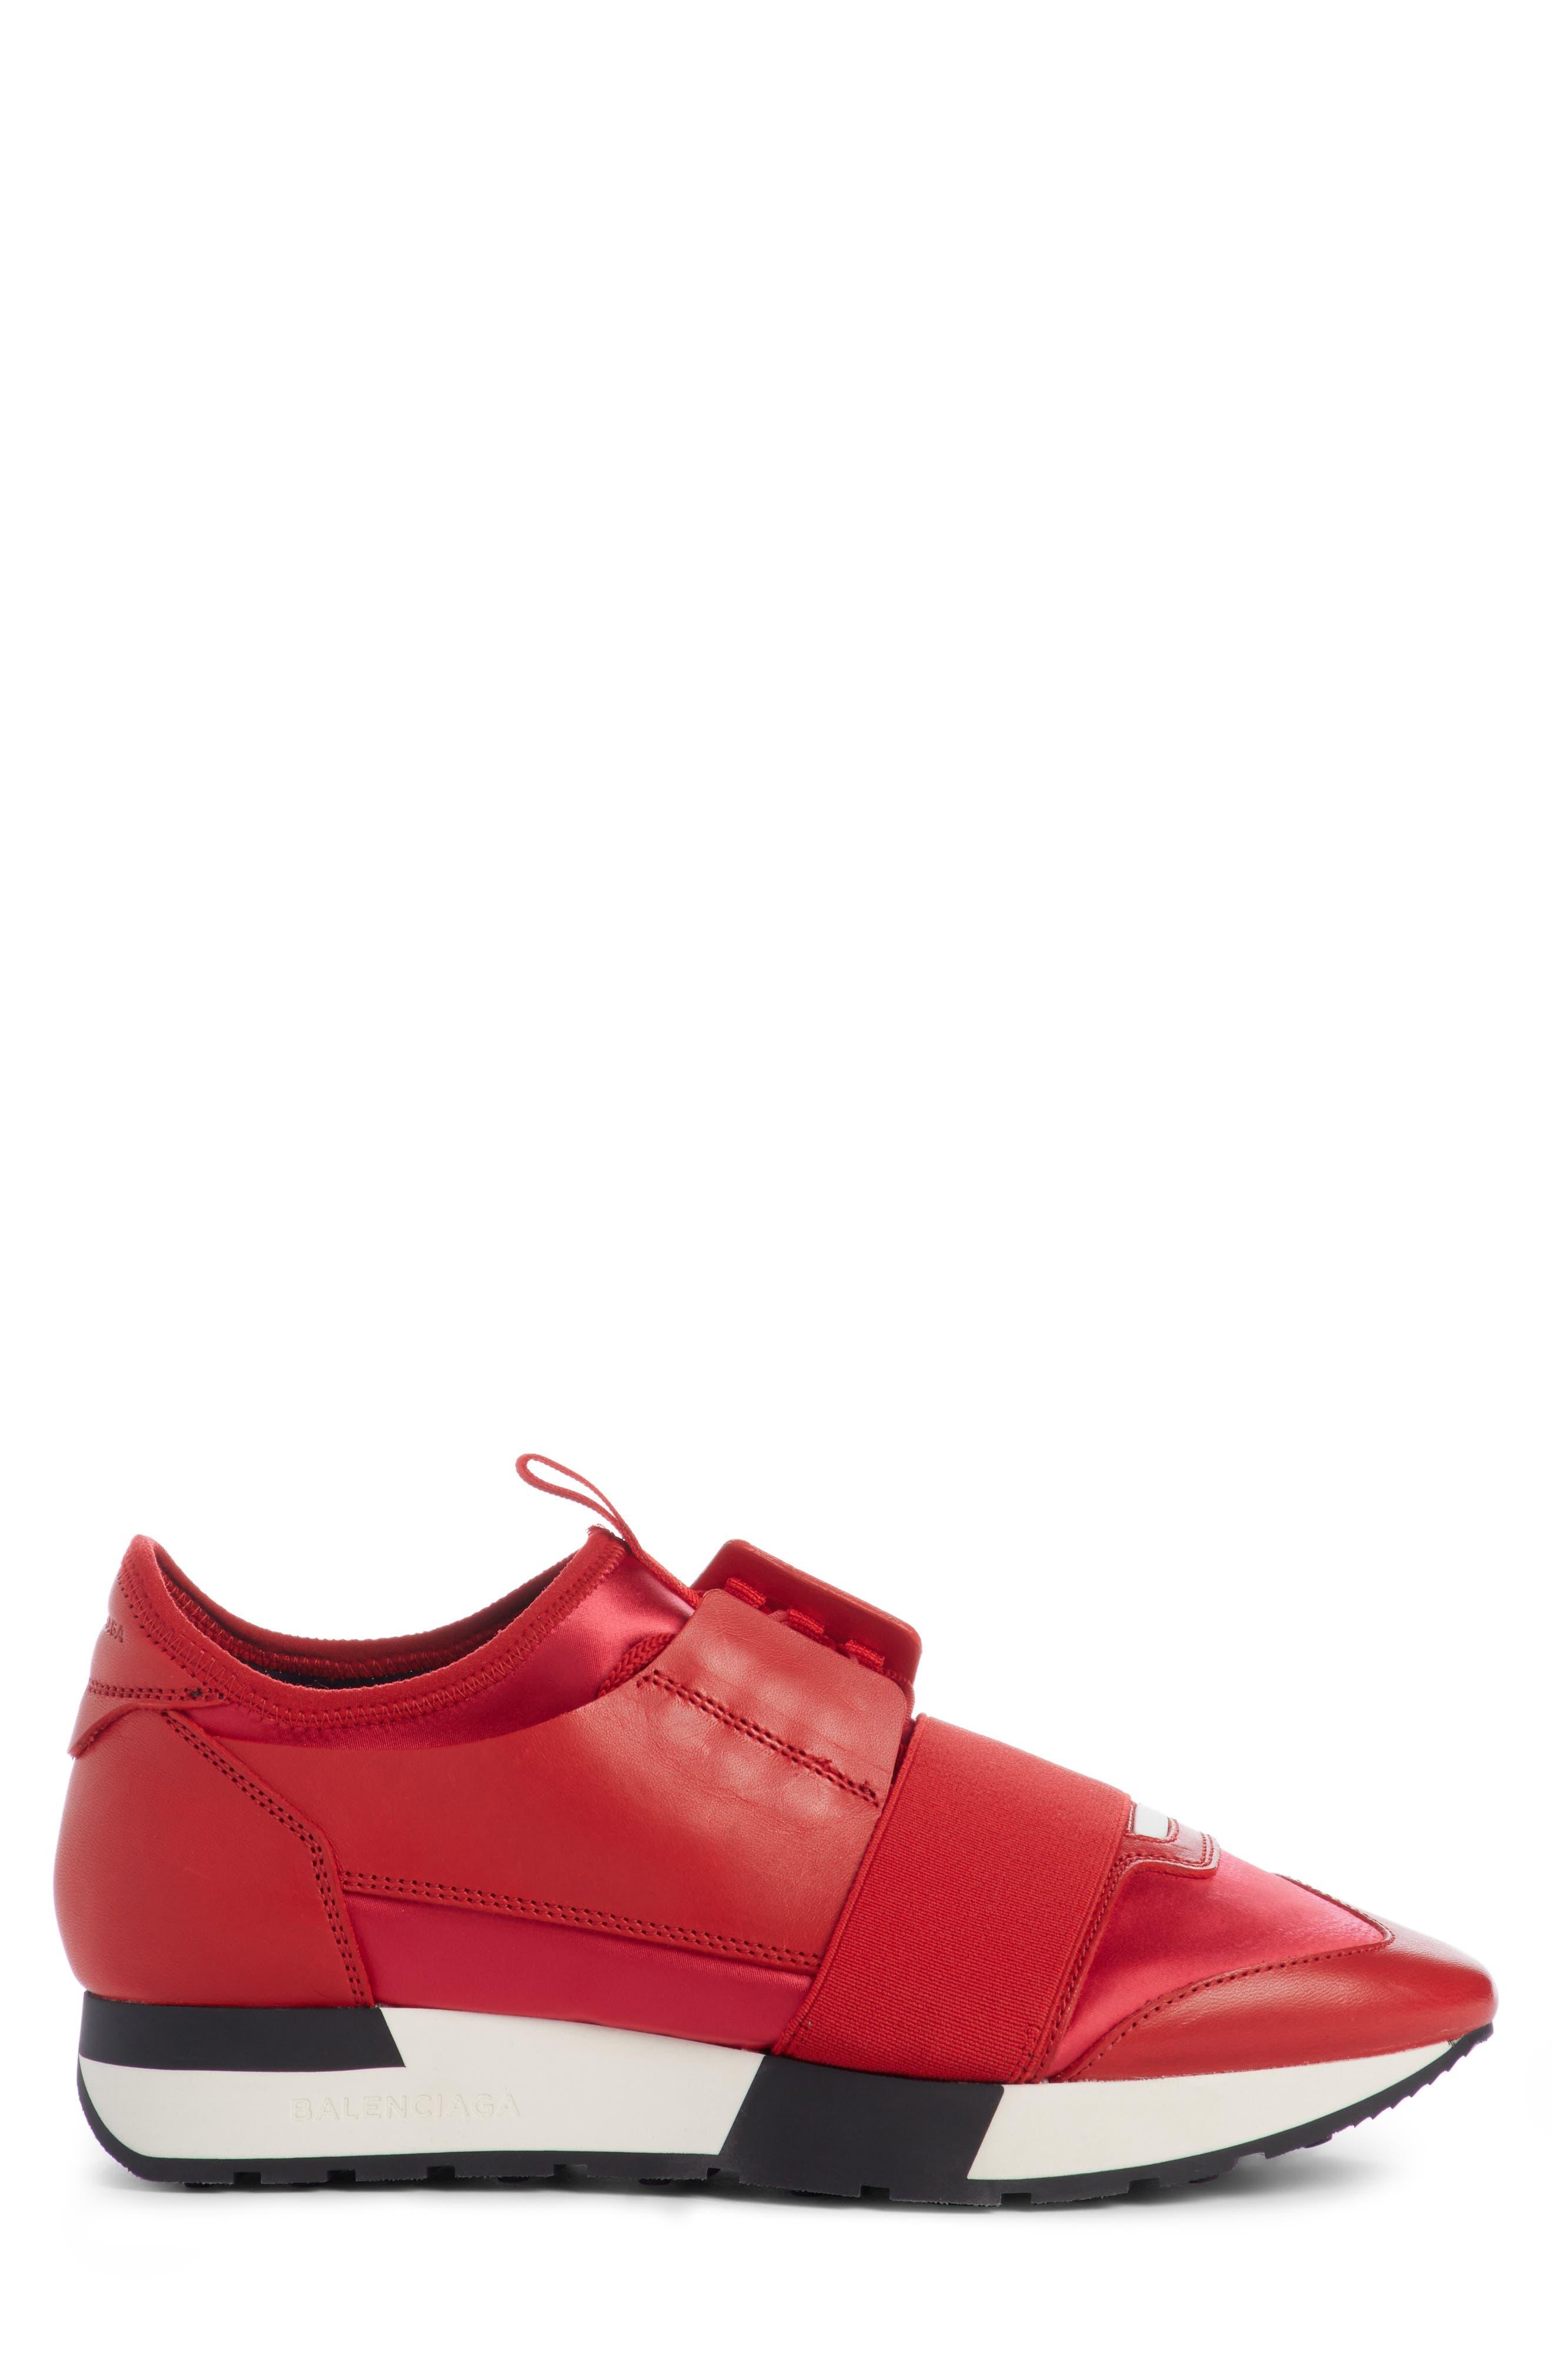 Alternate Image 3  - Balenciaga Mixed Media Trainer Sneaker (Women)